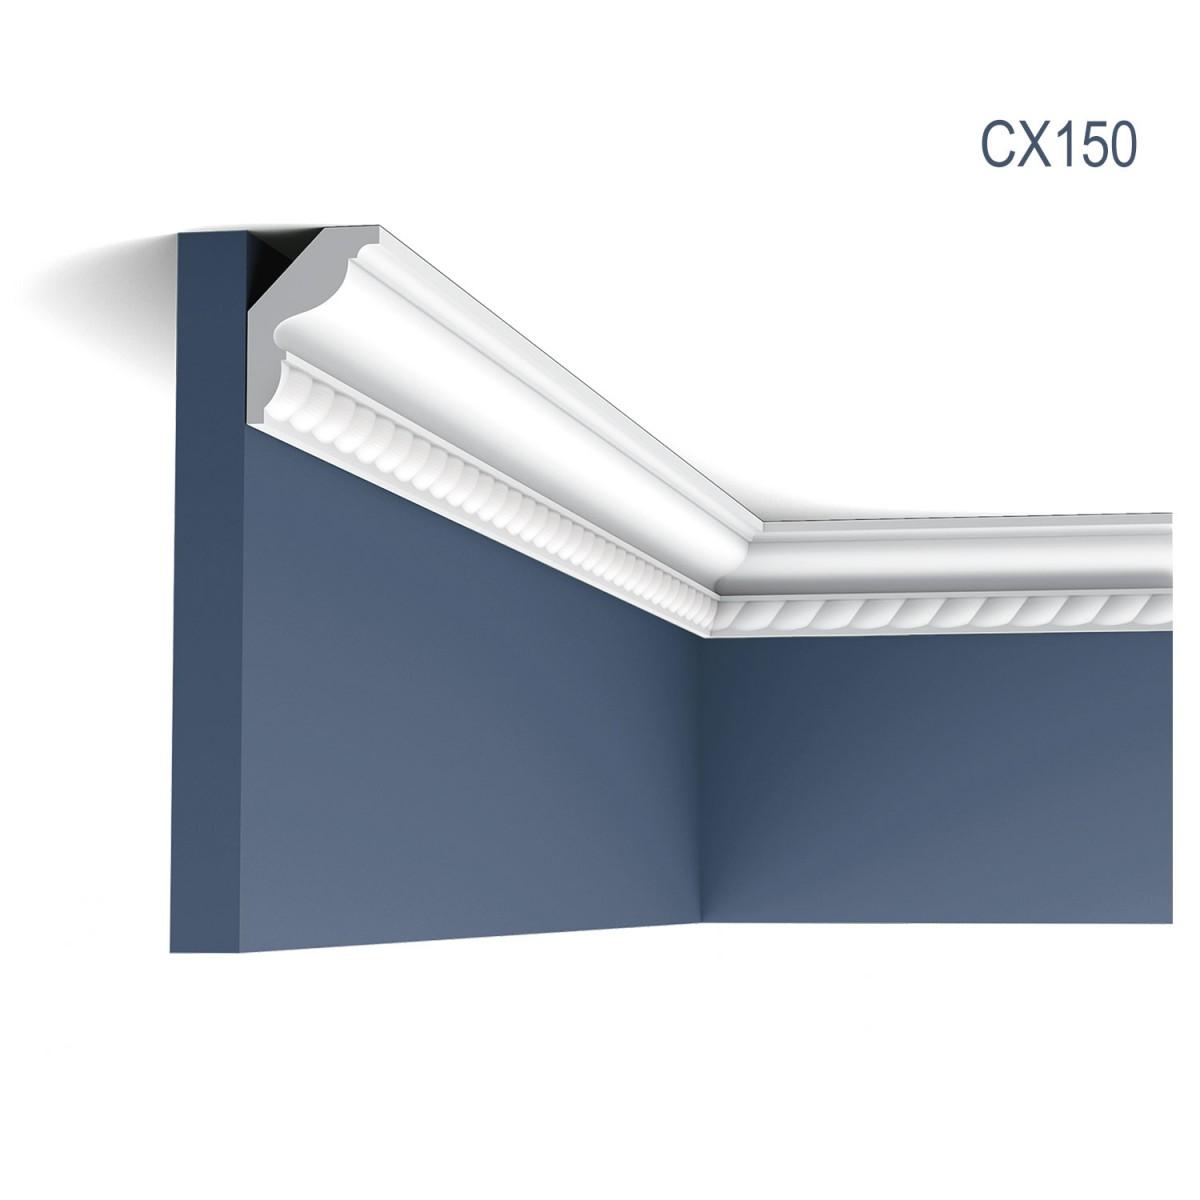 Cornisa Axxent CX150, Dimensiuni: 200 X 4.3 X 2.9 cm, Orac Decor